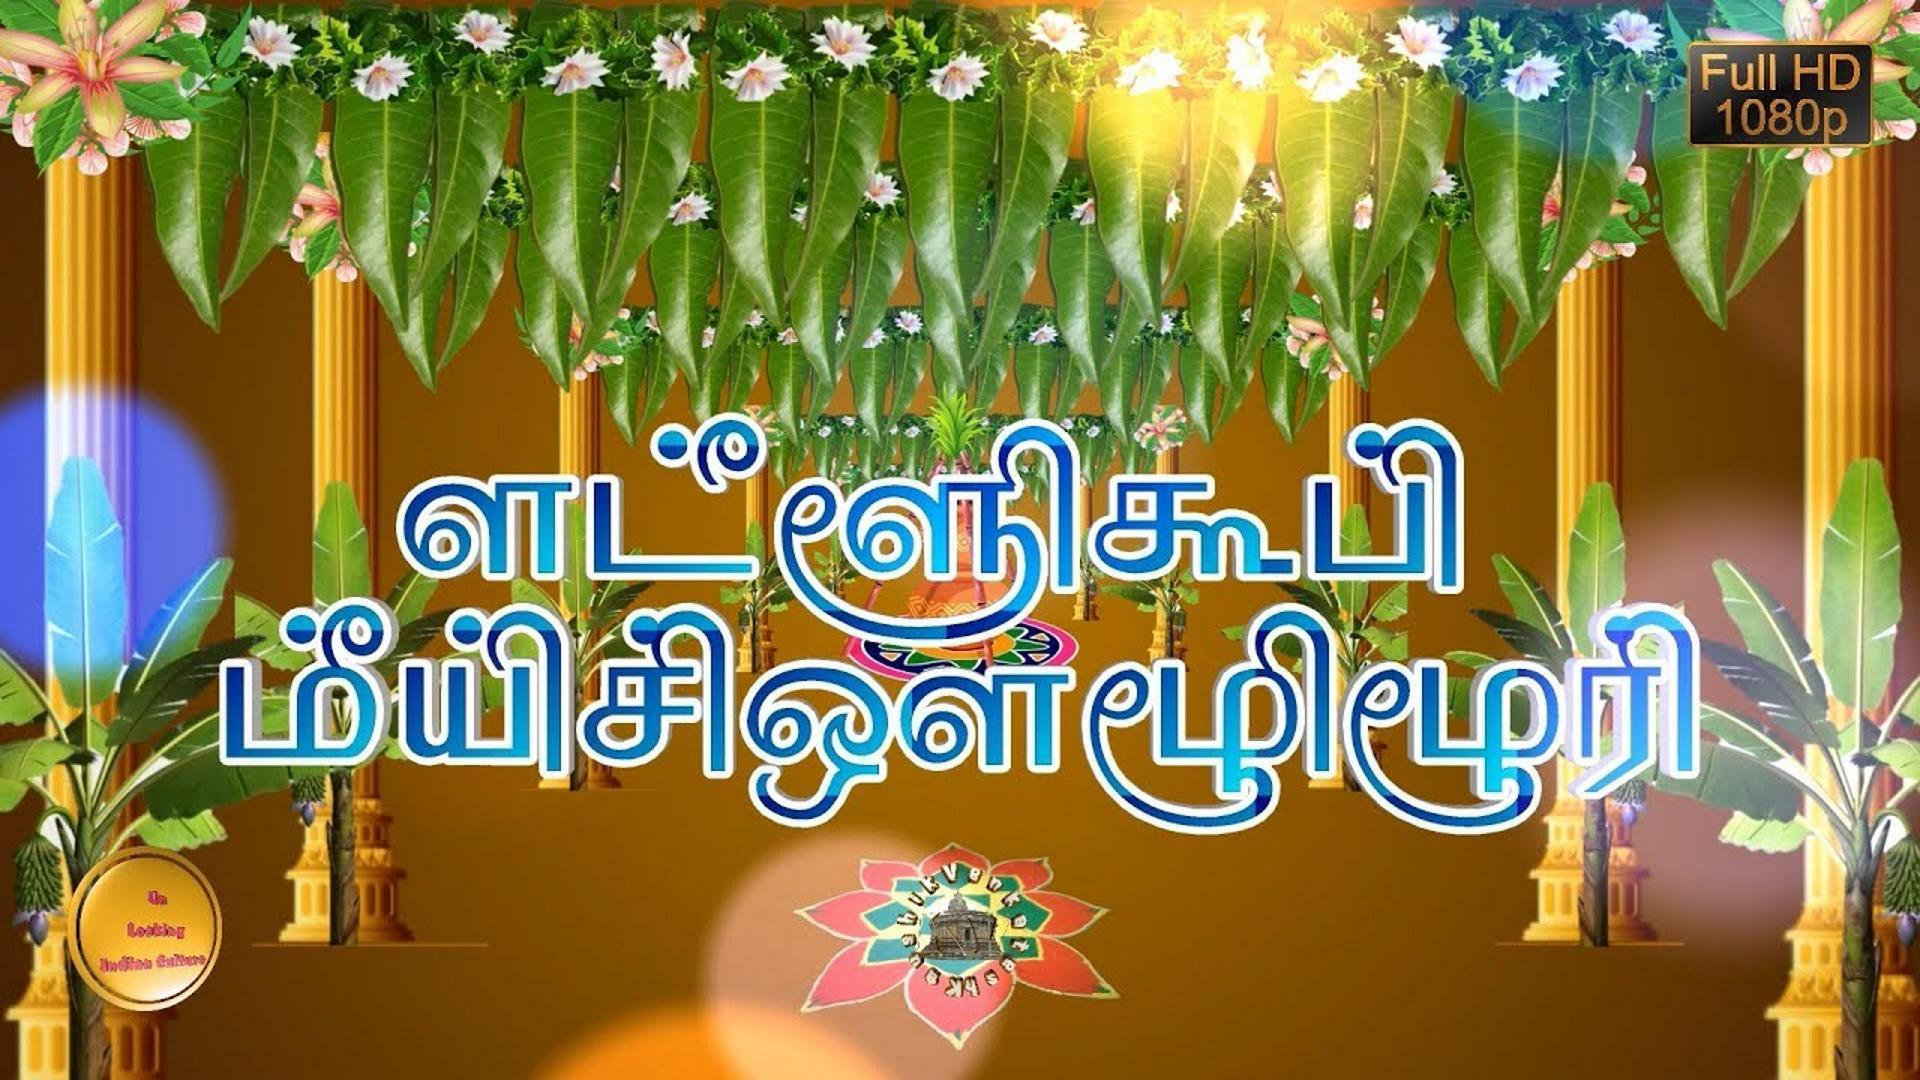 Greetings Image for the harvest festival of Tamil Nadu held on 14 January.